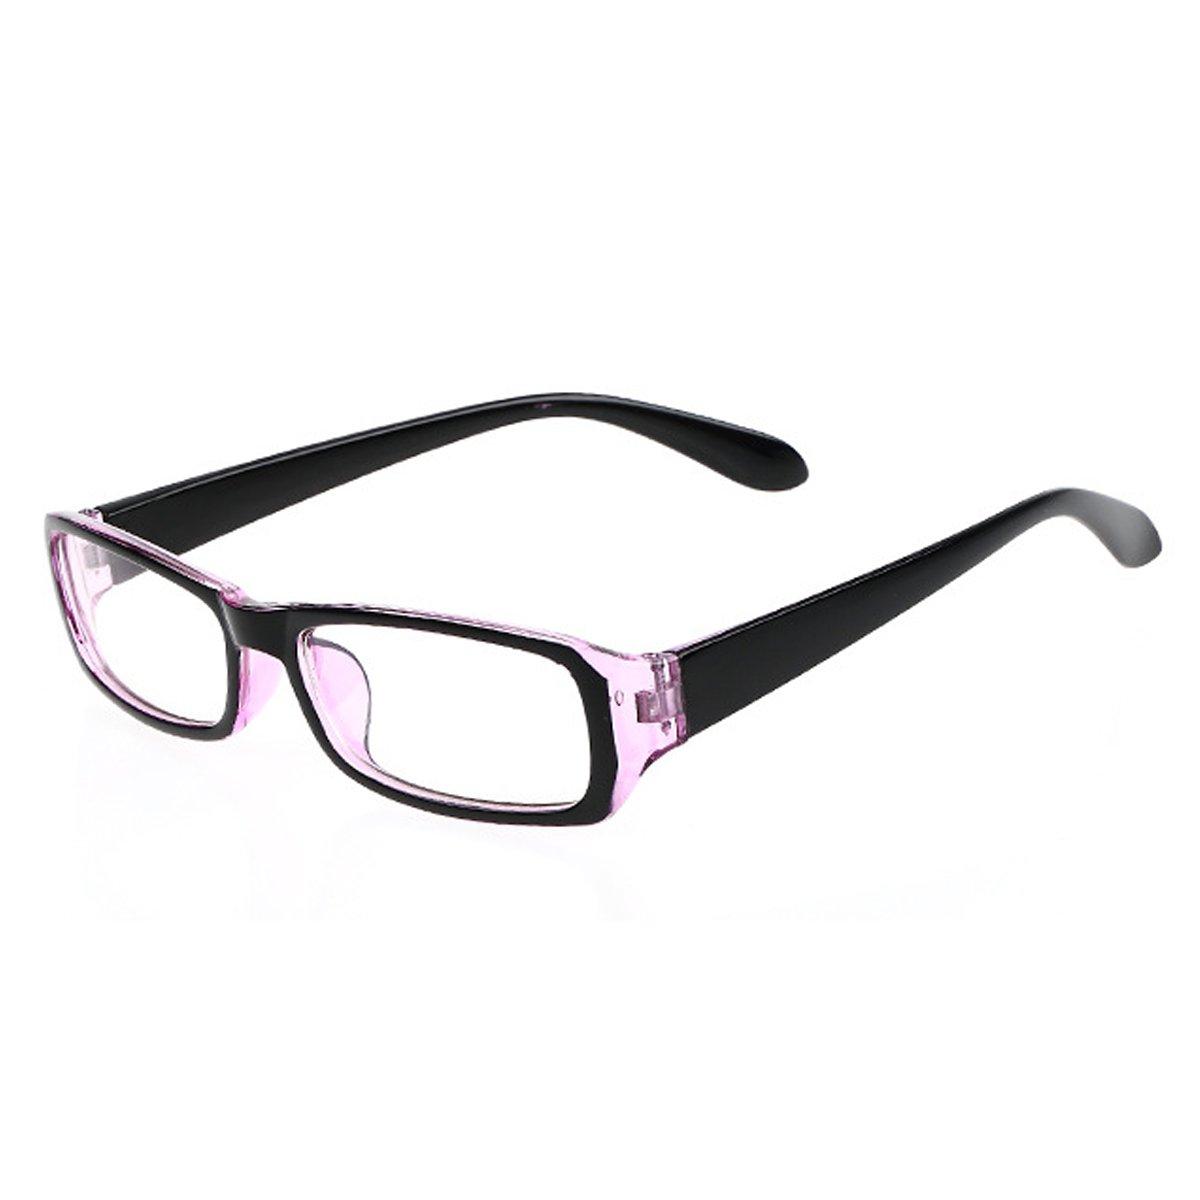 LA HAUTE Women Plain glasses Fashion Computer Gaming Glasses Rectangle Clear Lens Anti-Uv Eyewear